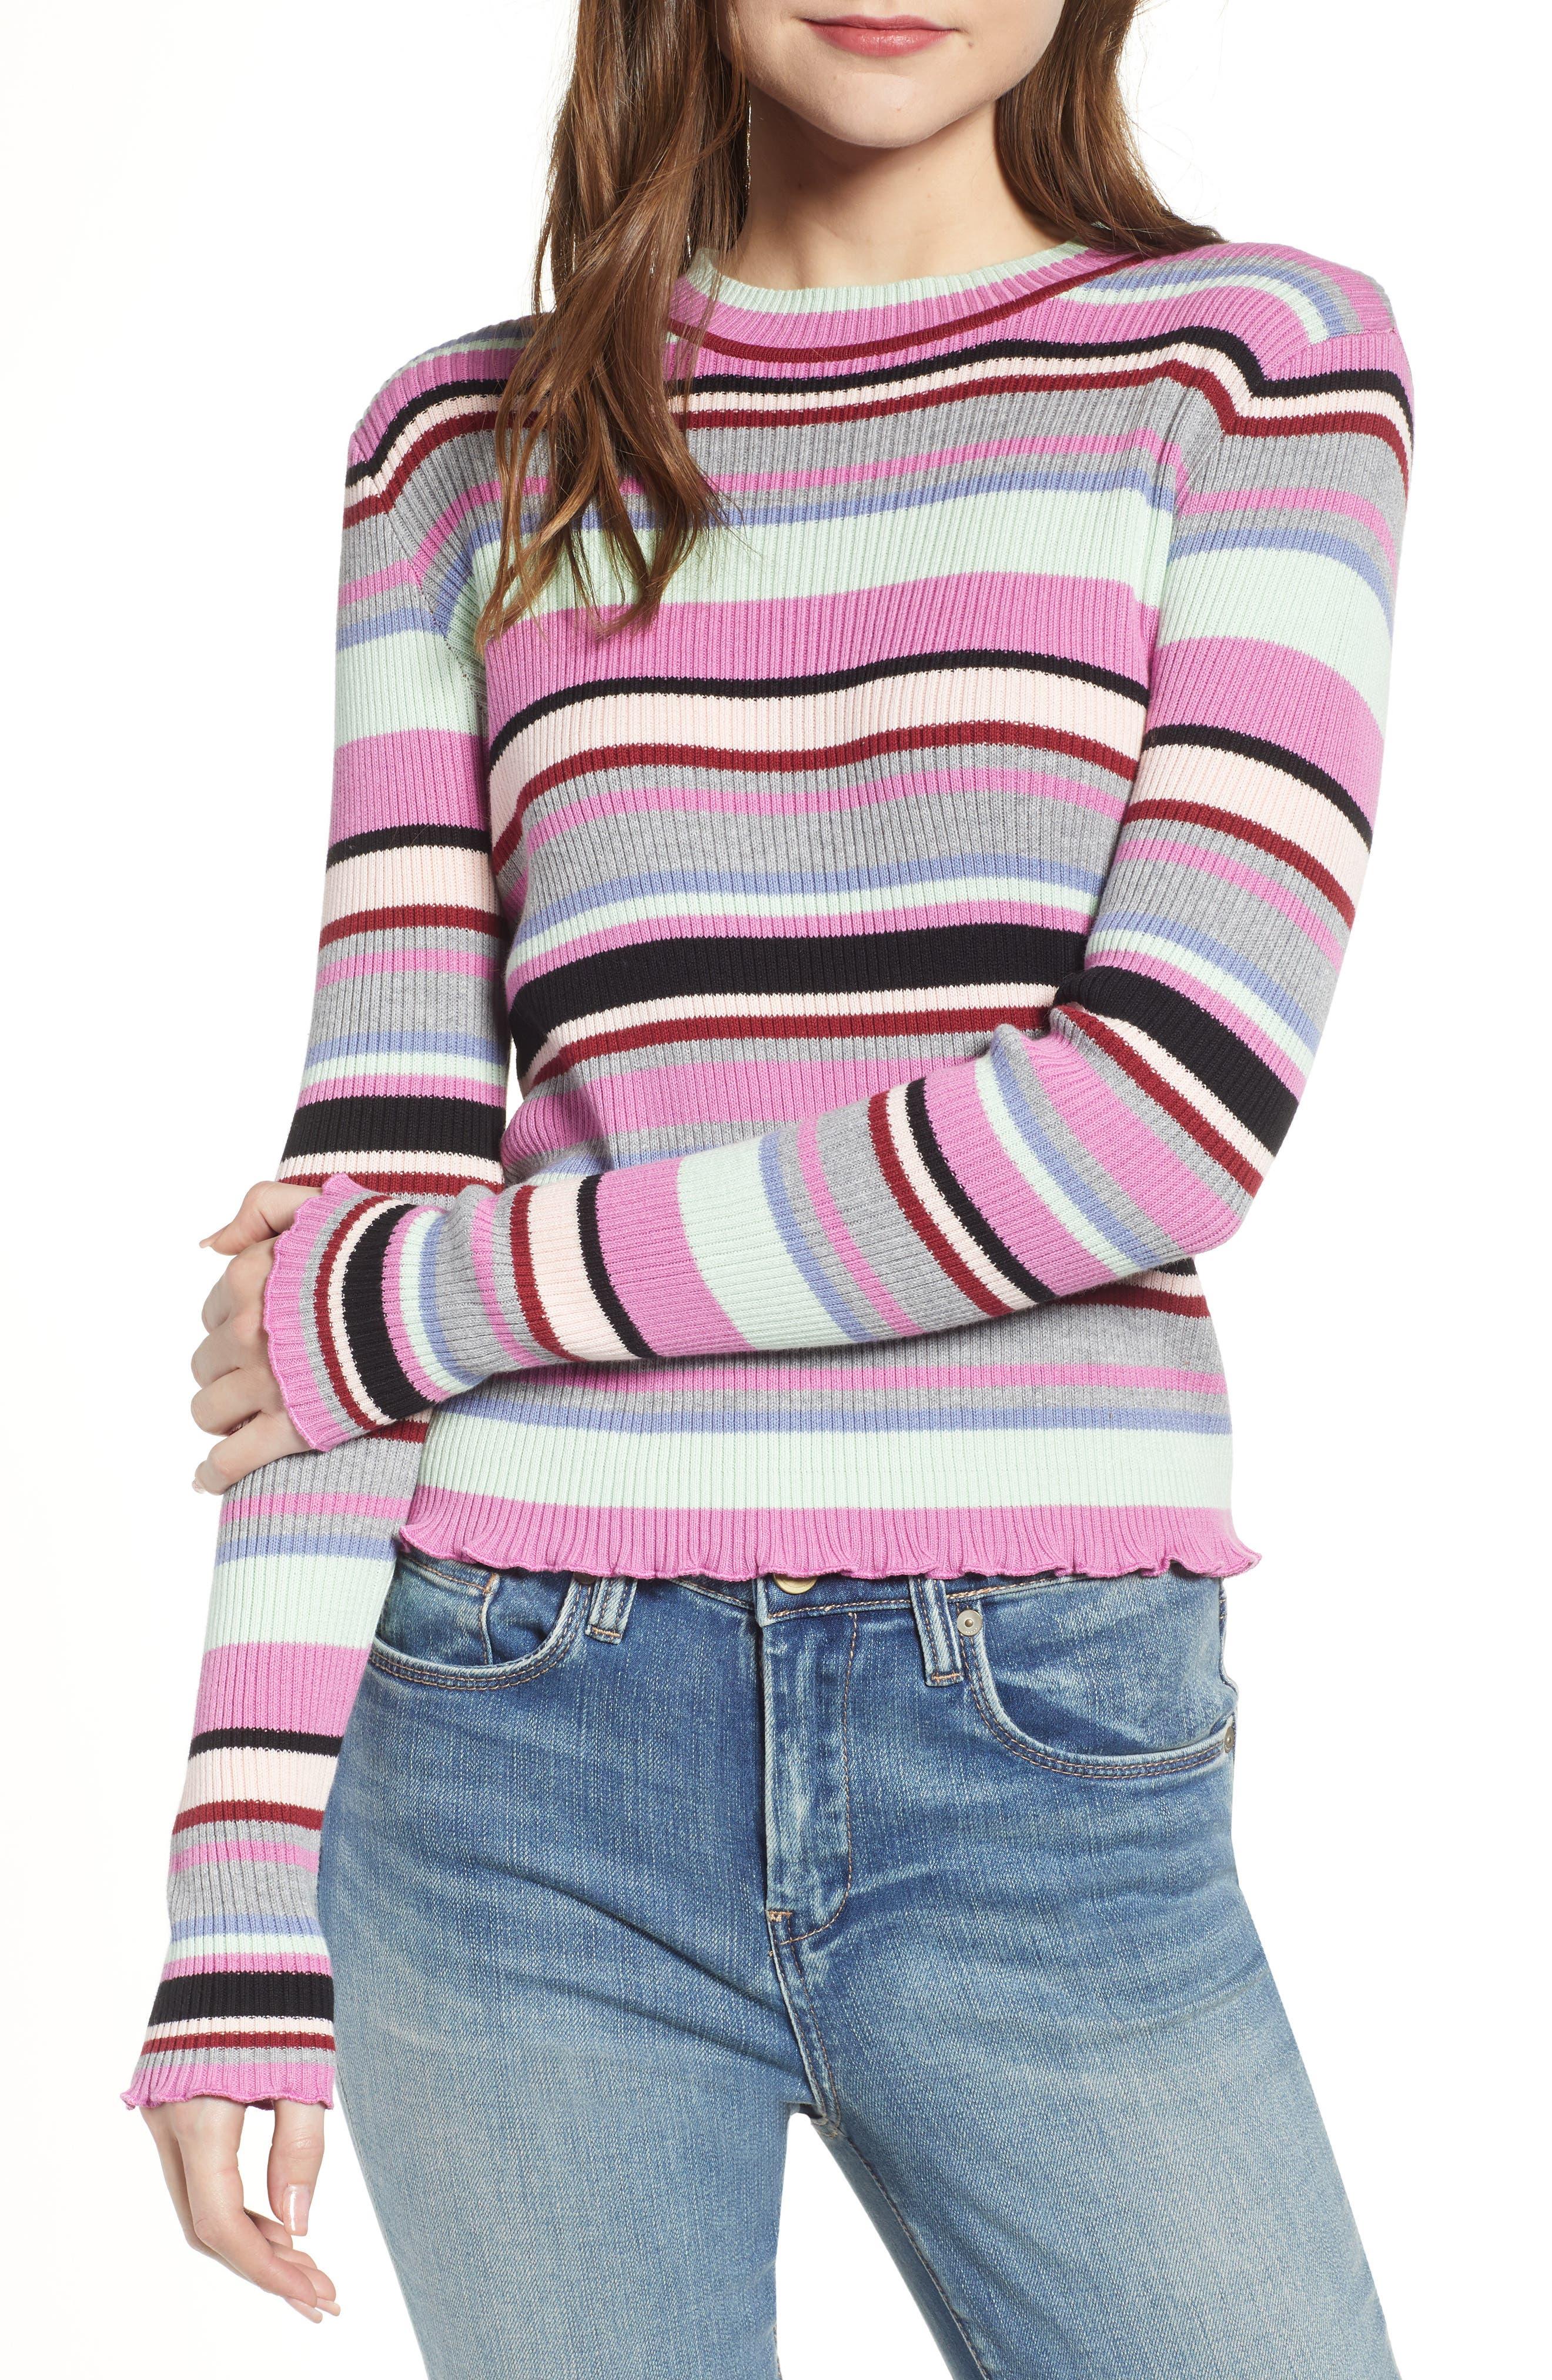 Ribbed Lettuce Edge Stripe Sweater,                         Main,                         color, PURPLE TAFFY KARA MULTI STRIPE